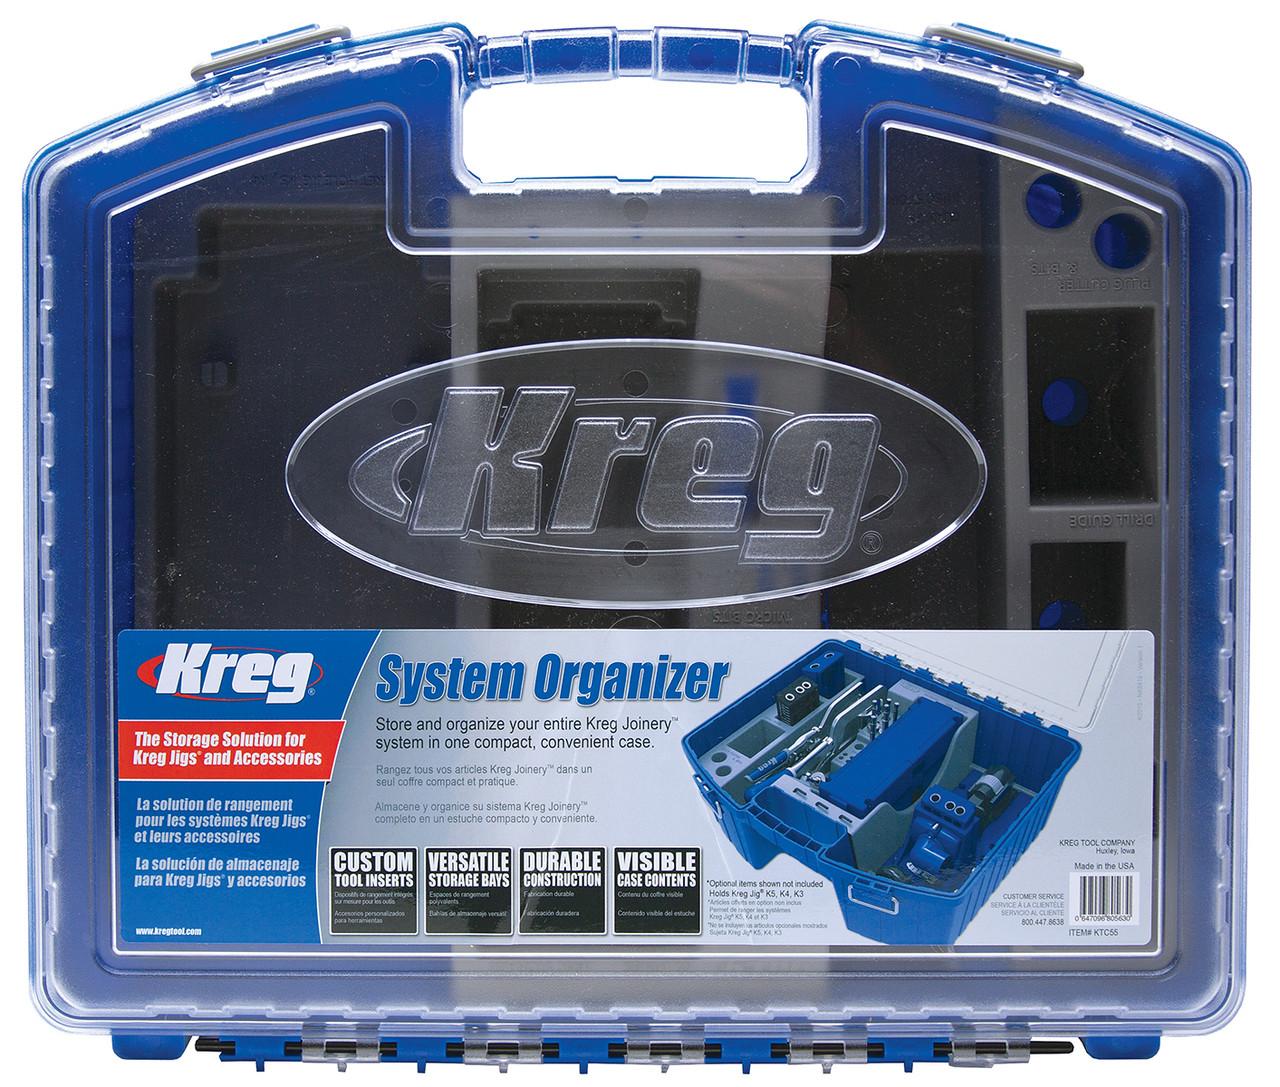 Kreg System Organizer KTC55